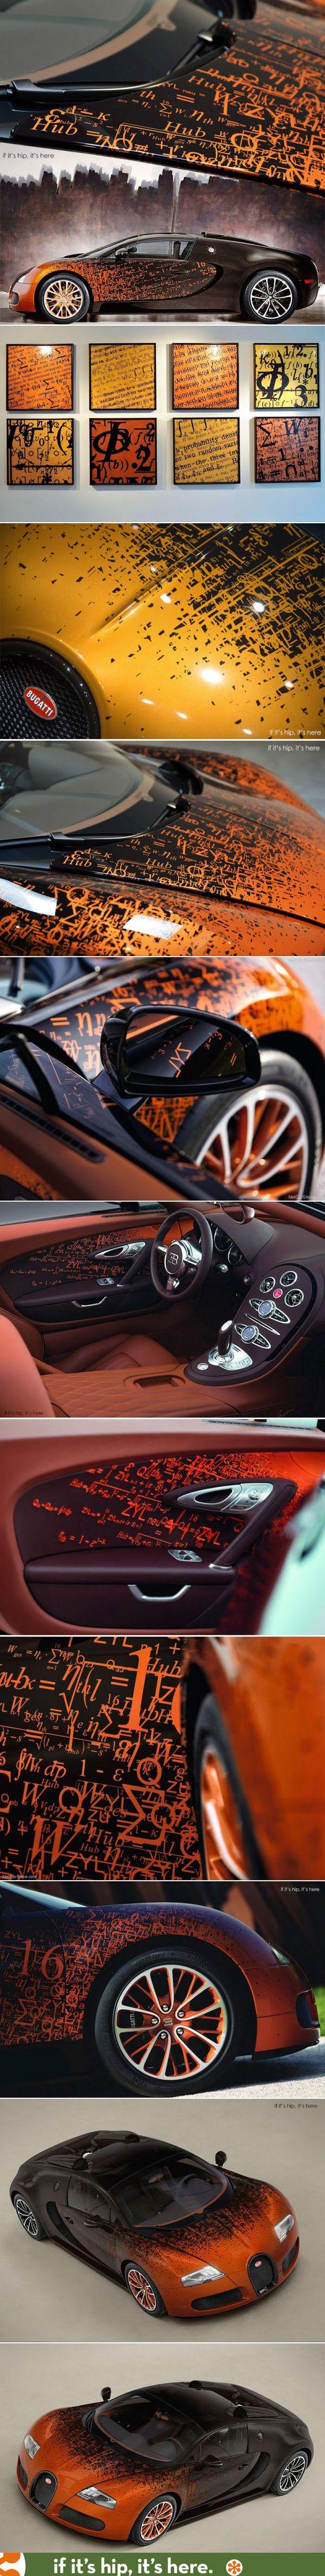 9cf577511f16eedcf50bc5df16889ac4 Outstanding Bugatti Veyron Price In Kolkata Cars Trend